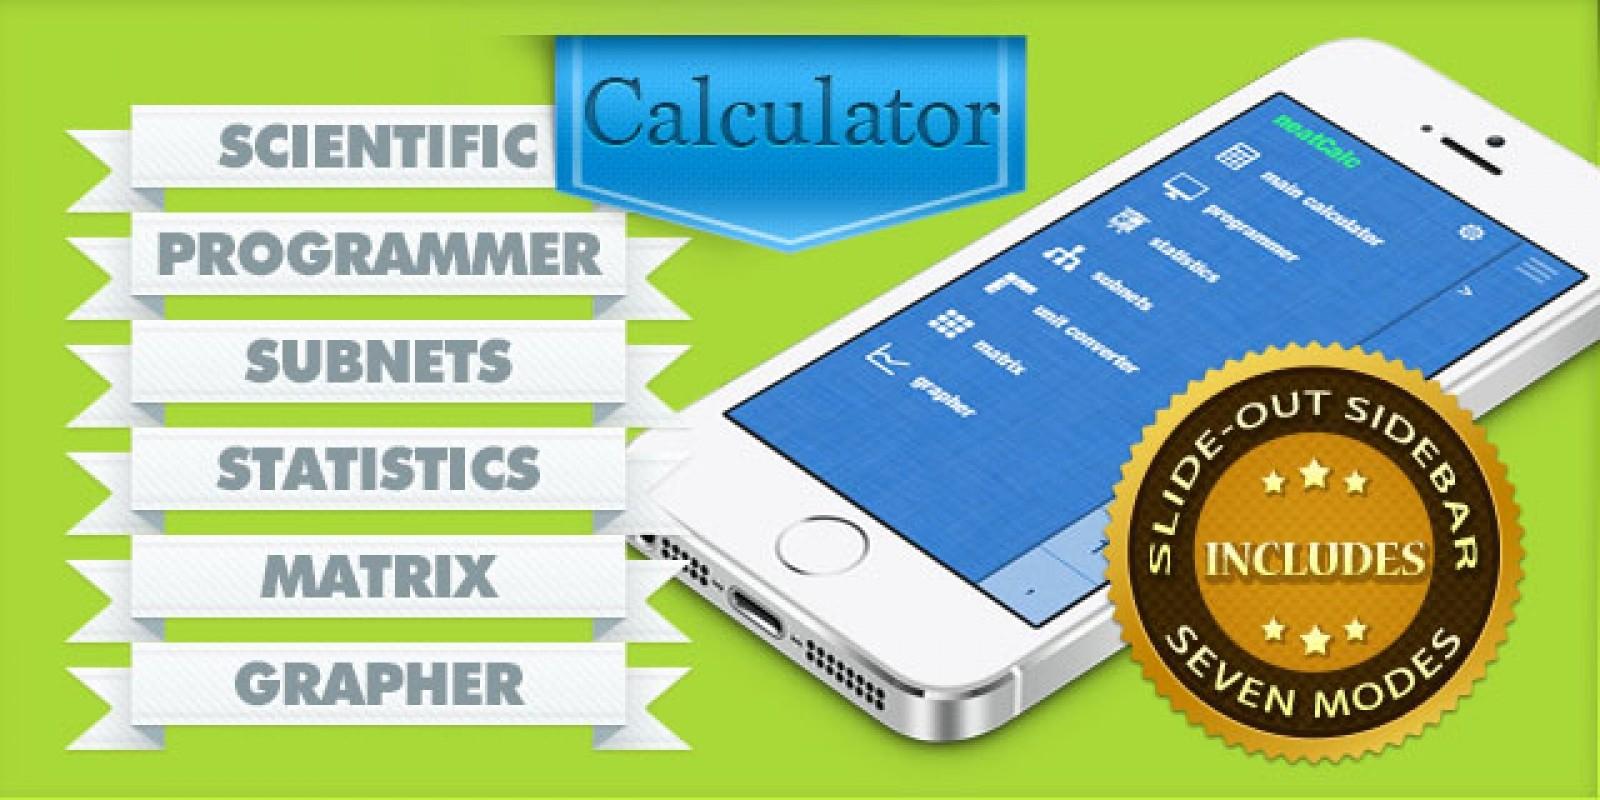 Multifunction Calculator - iOS App Source Code